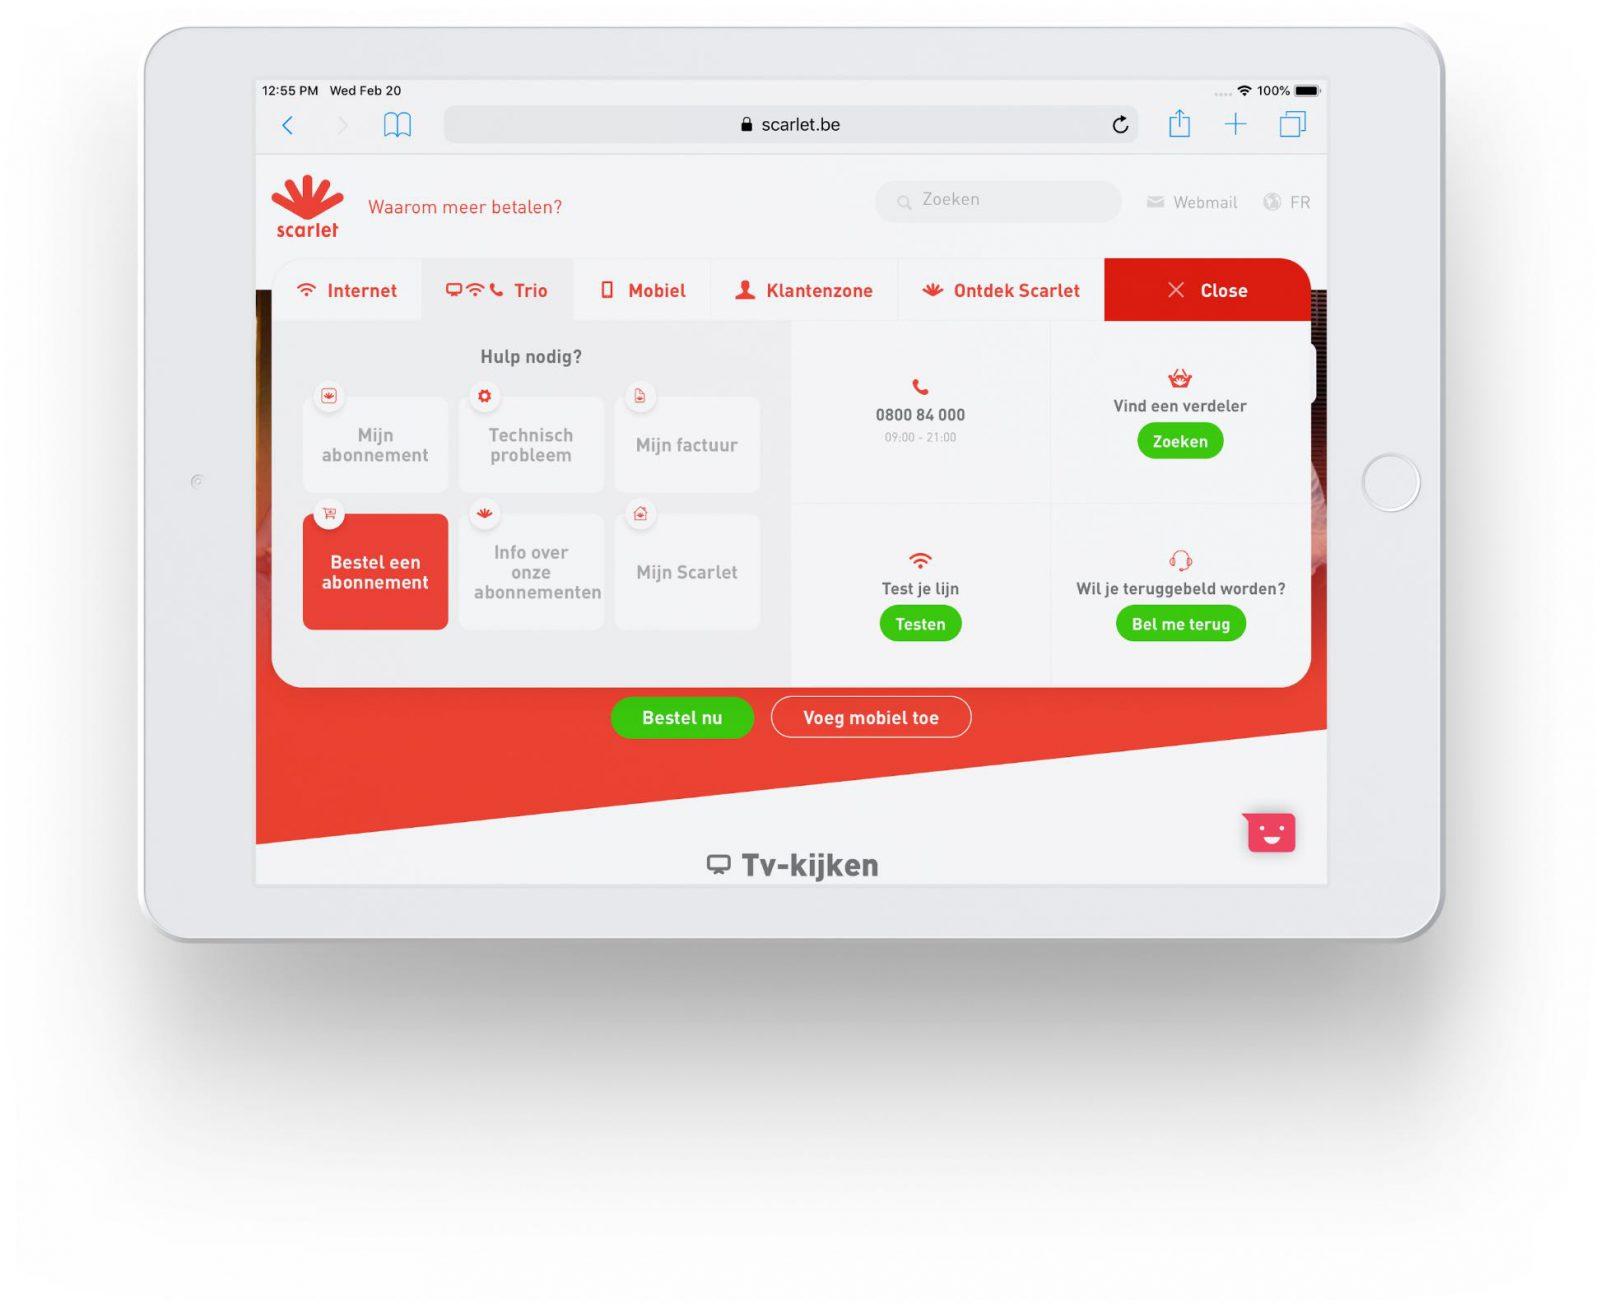 Scarlet FAQ module on tablet resolution